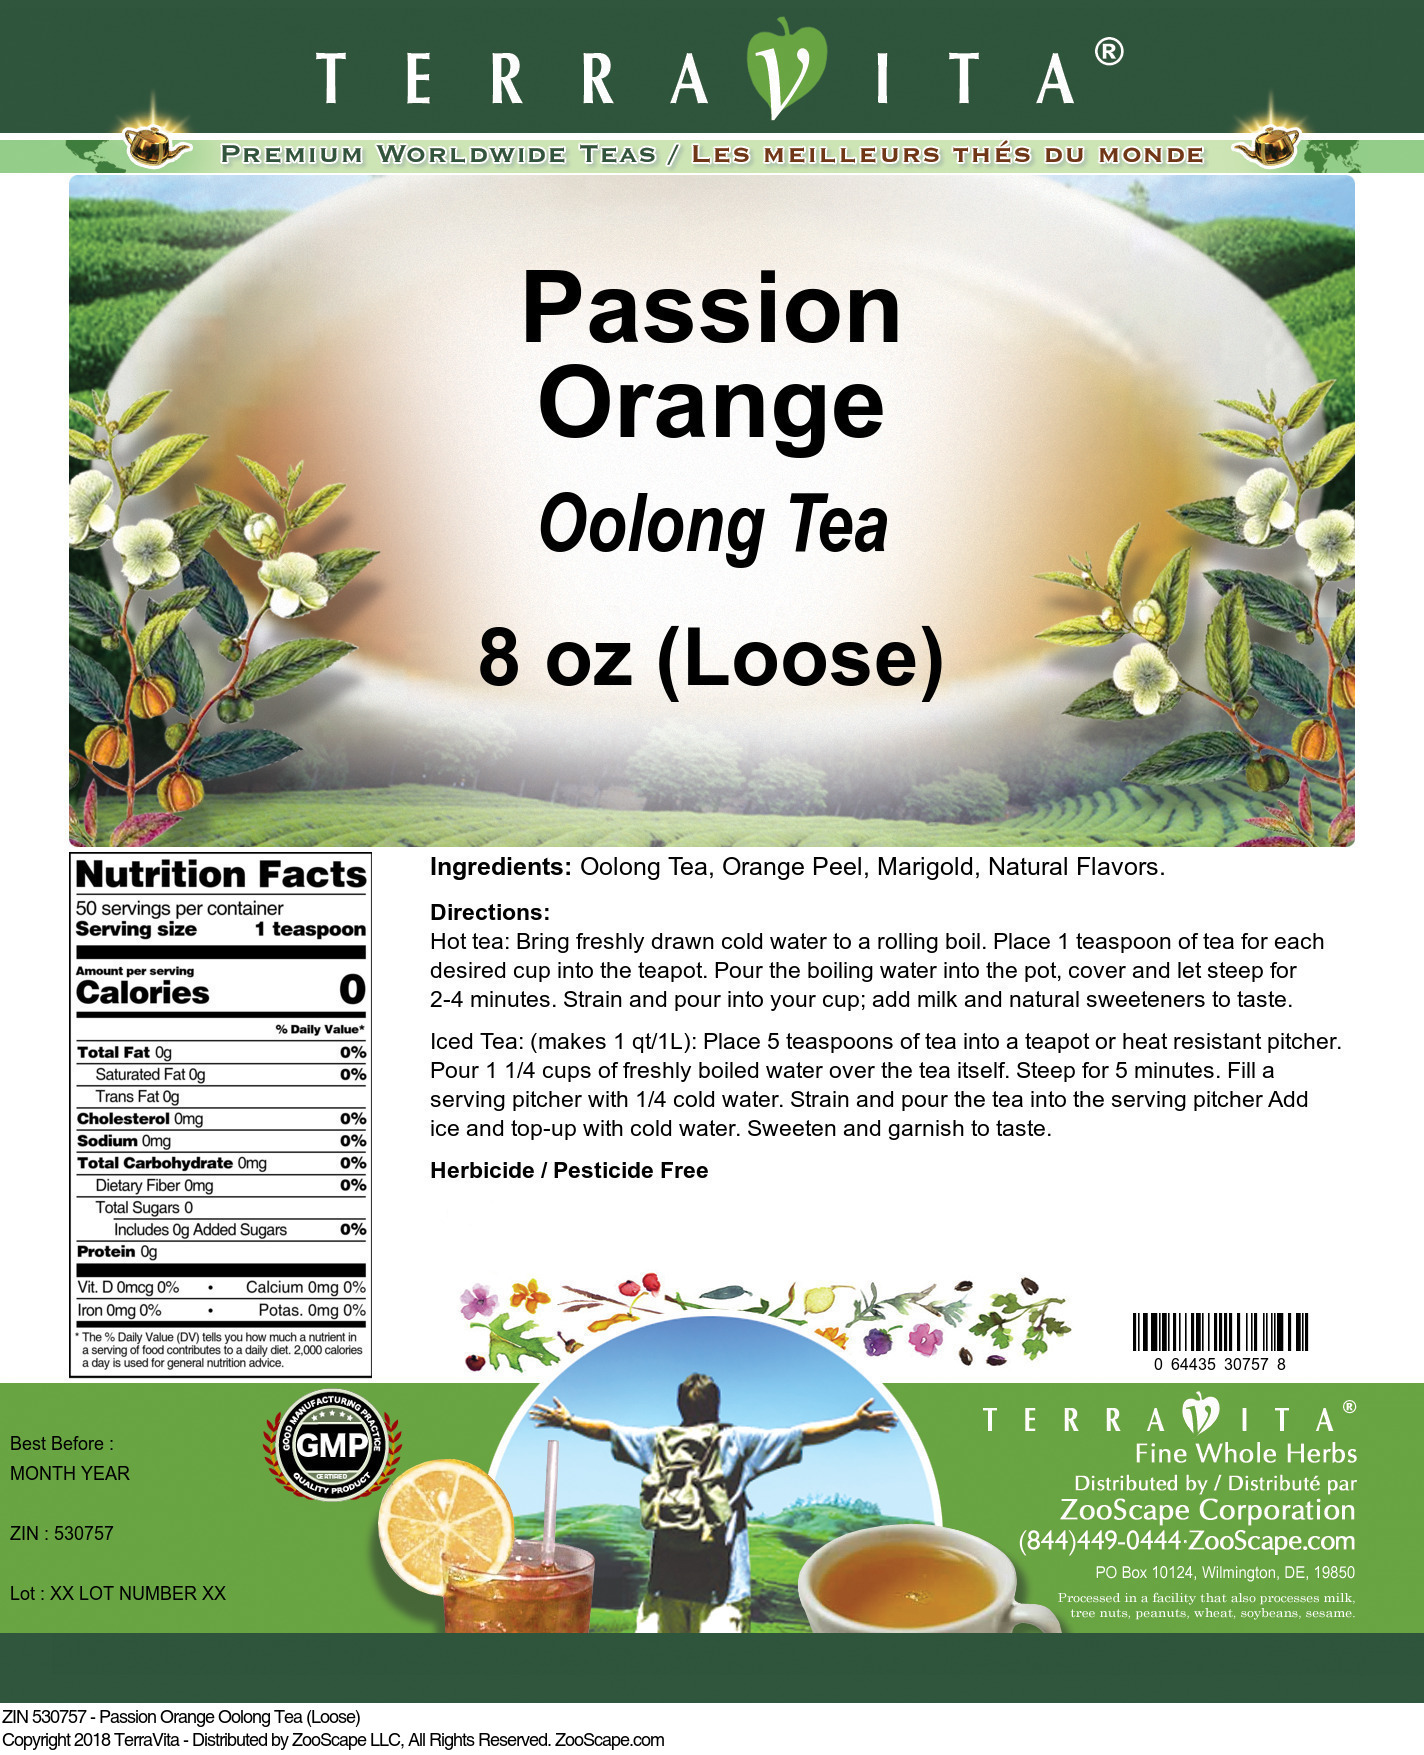 Passion Orange Oolong Tea (Loose)